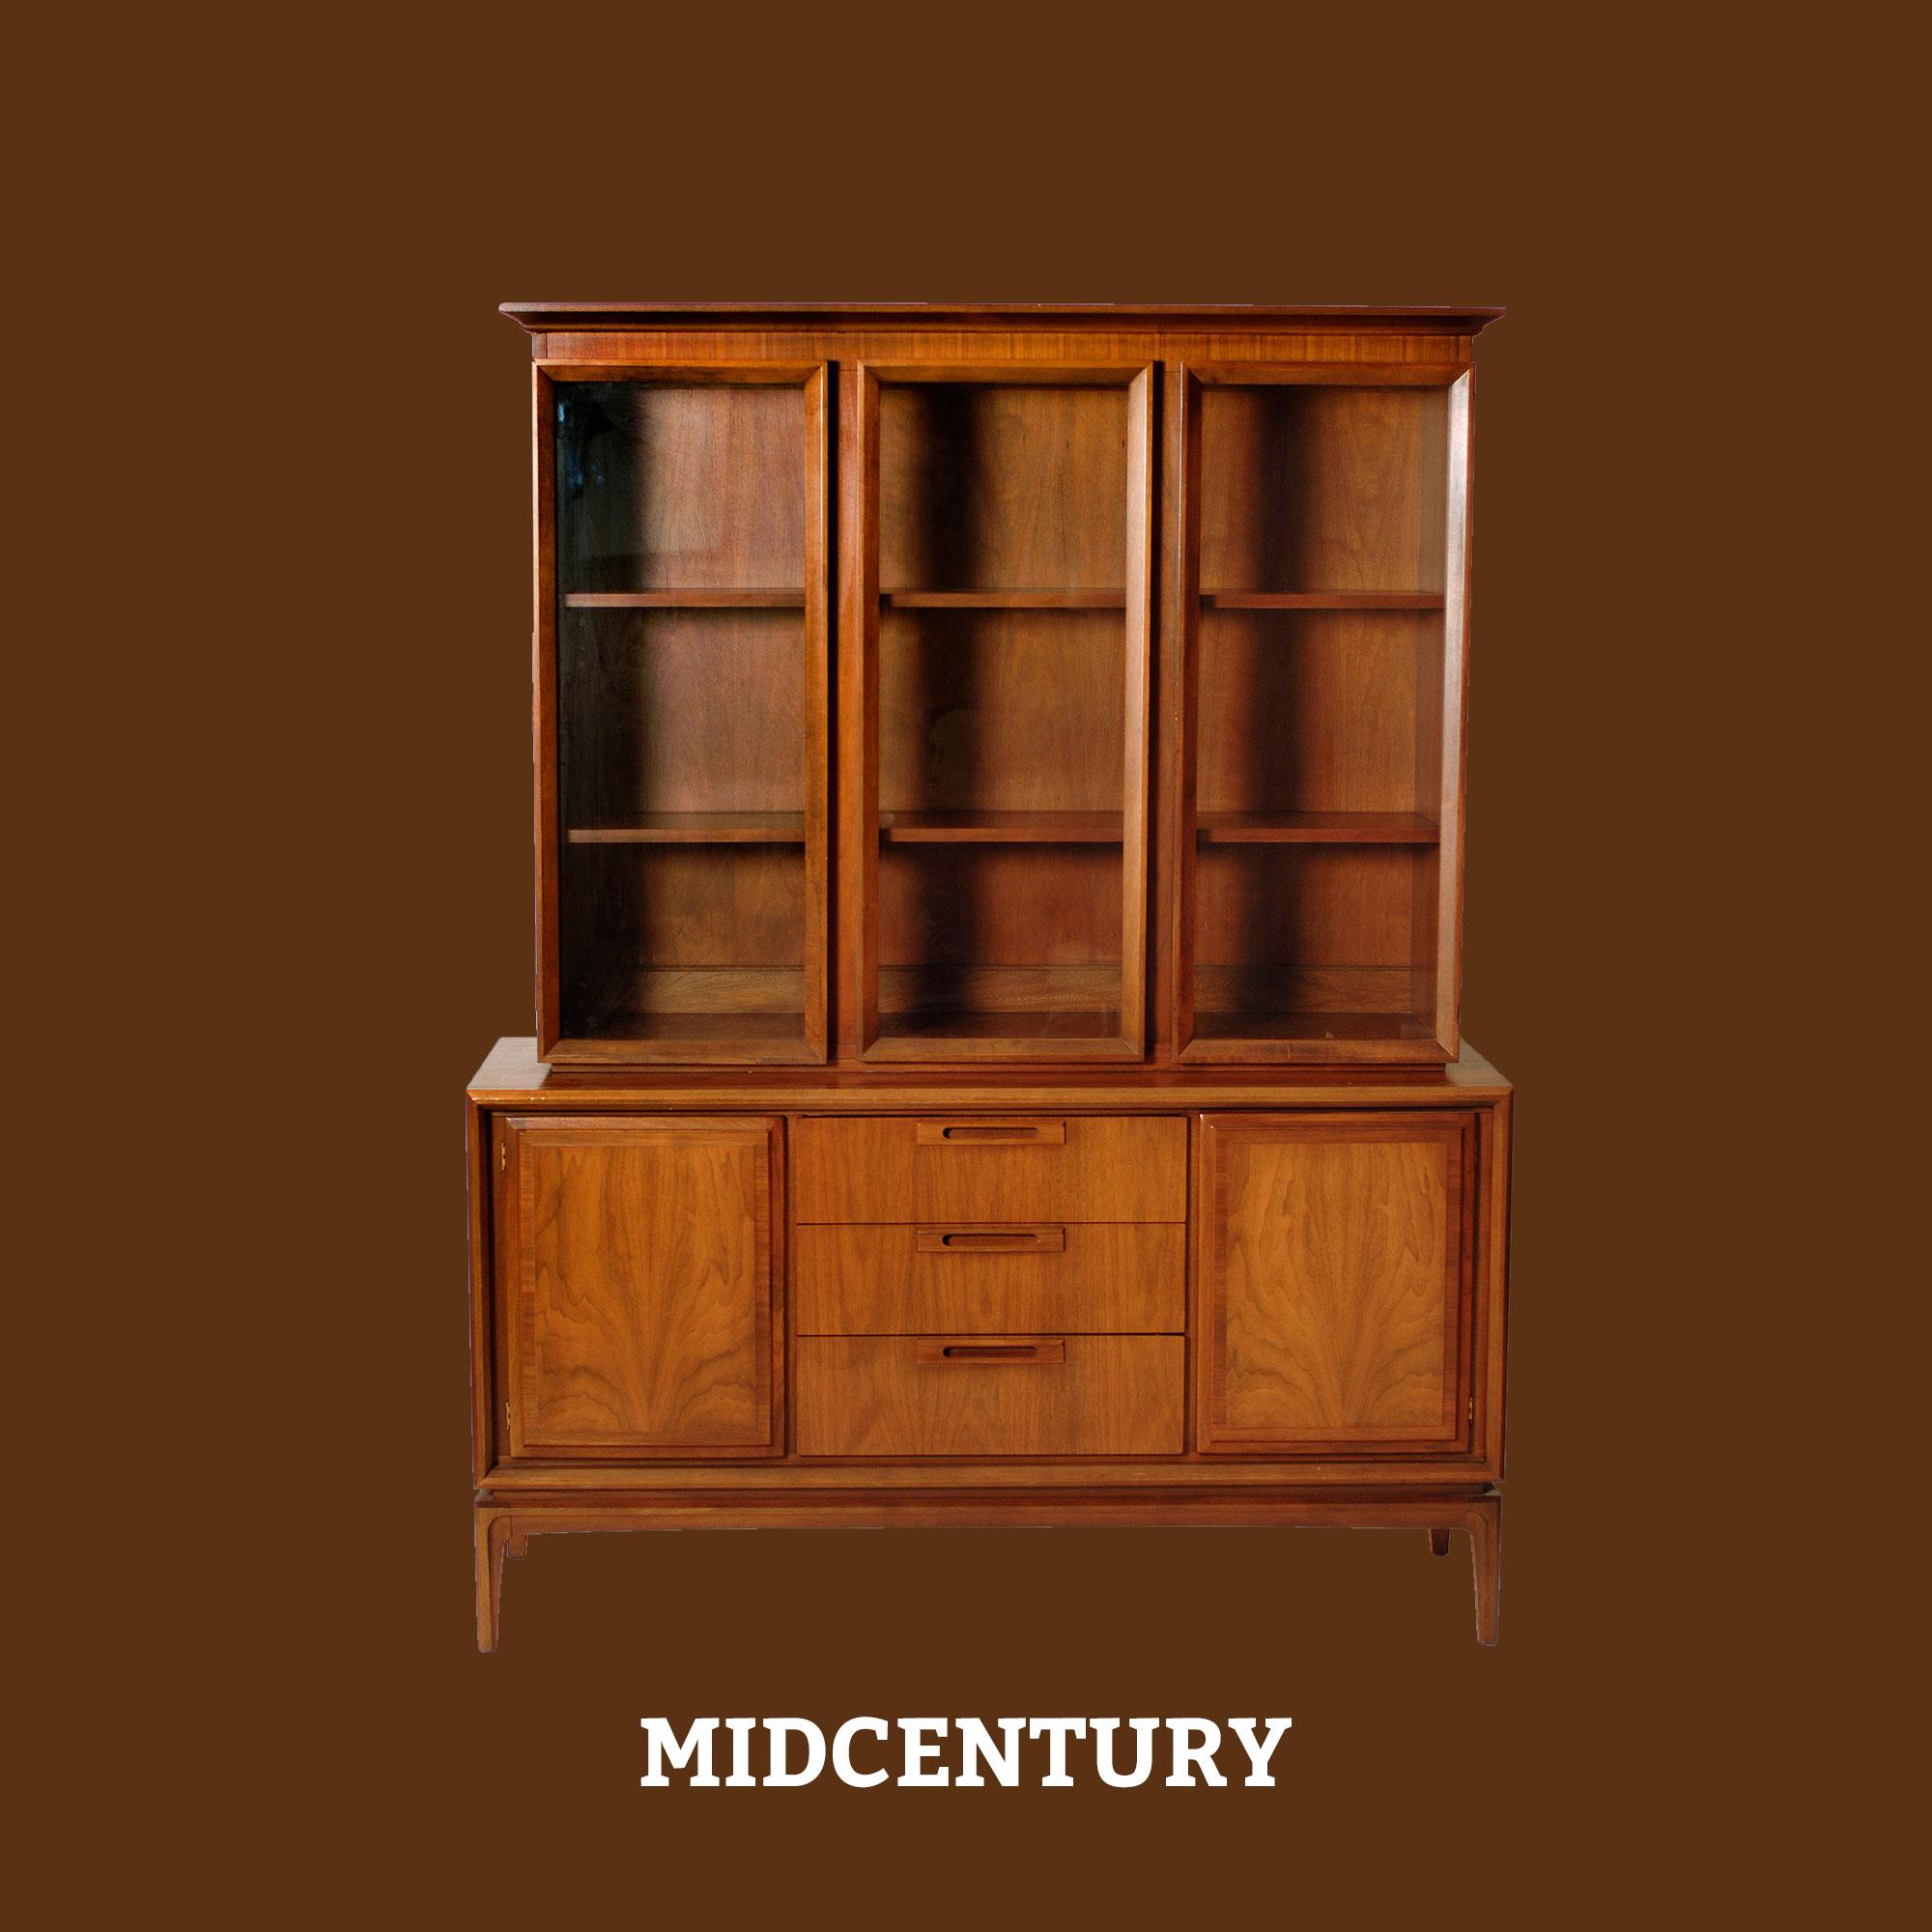 Harrington Galleries - Midcentury Furniture